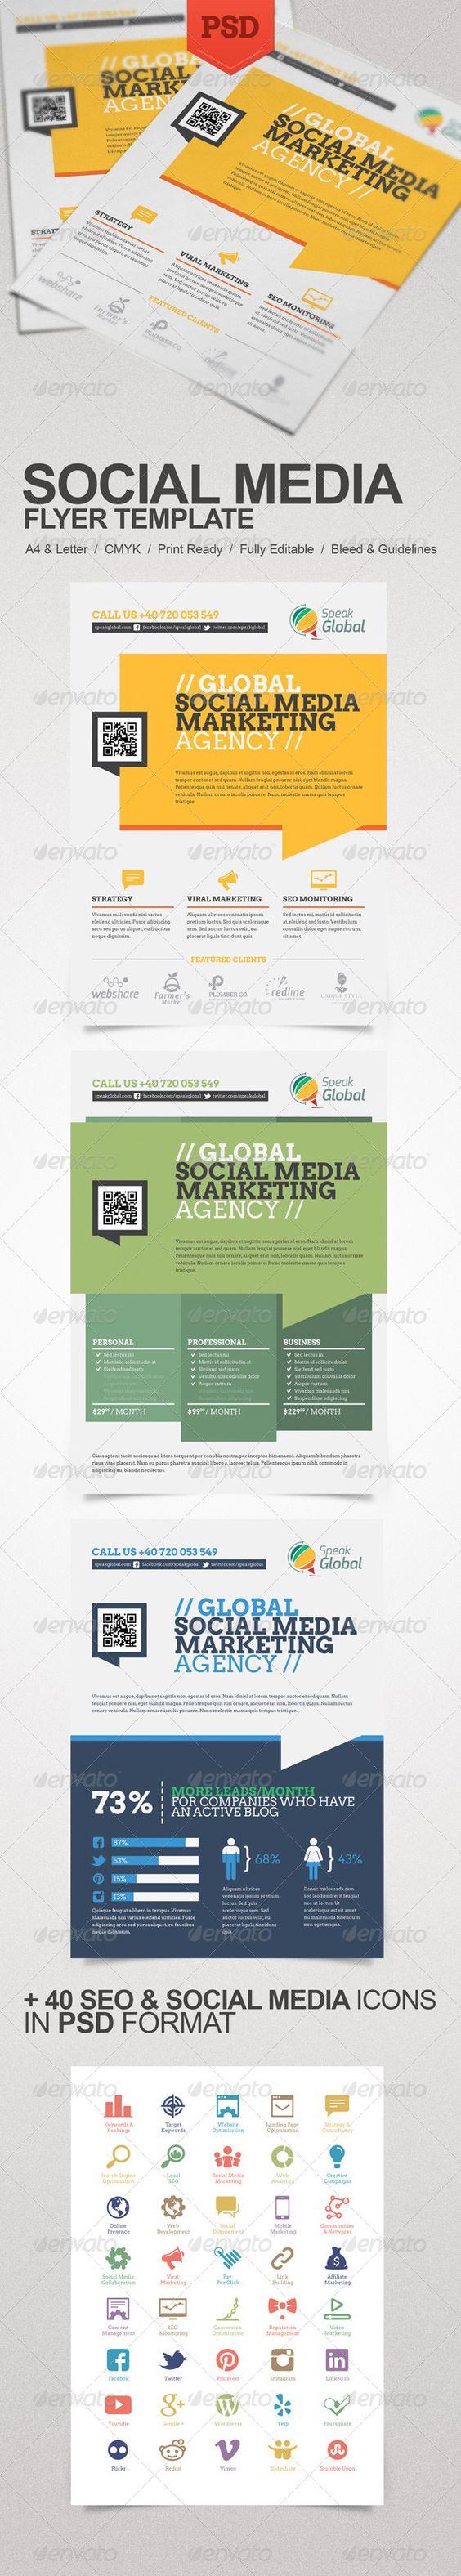 What should I put on a flyer advertising translation?